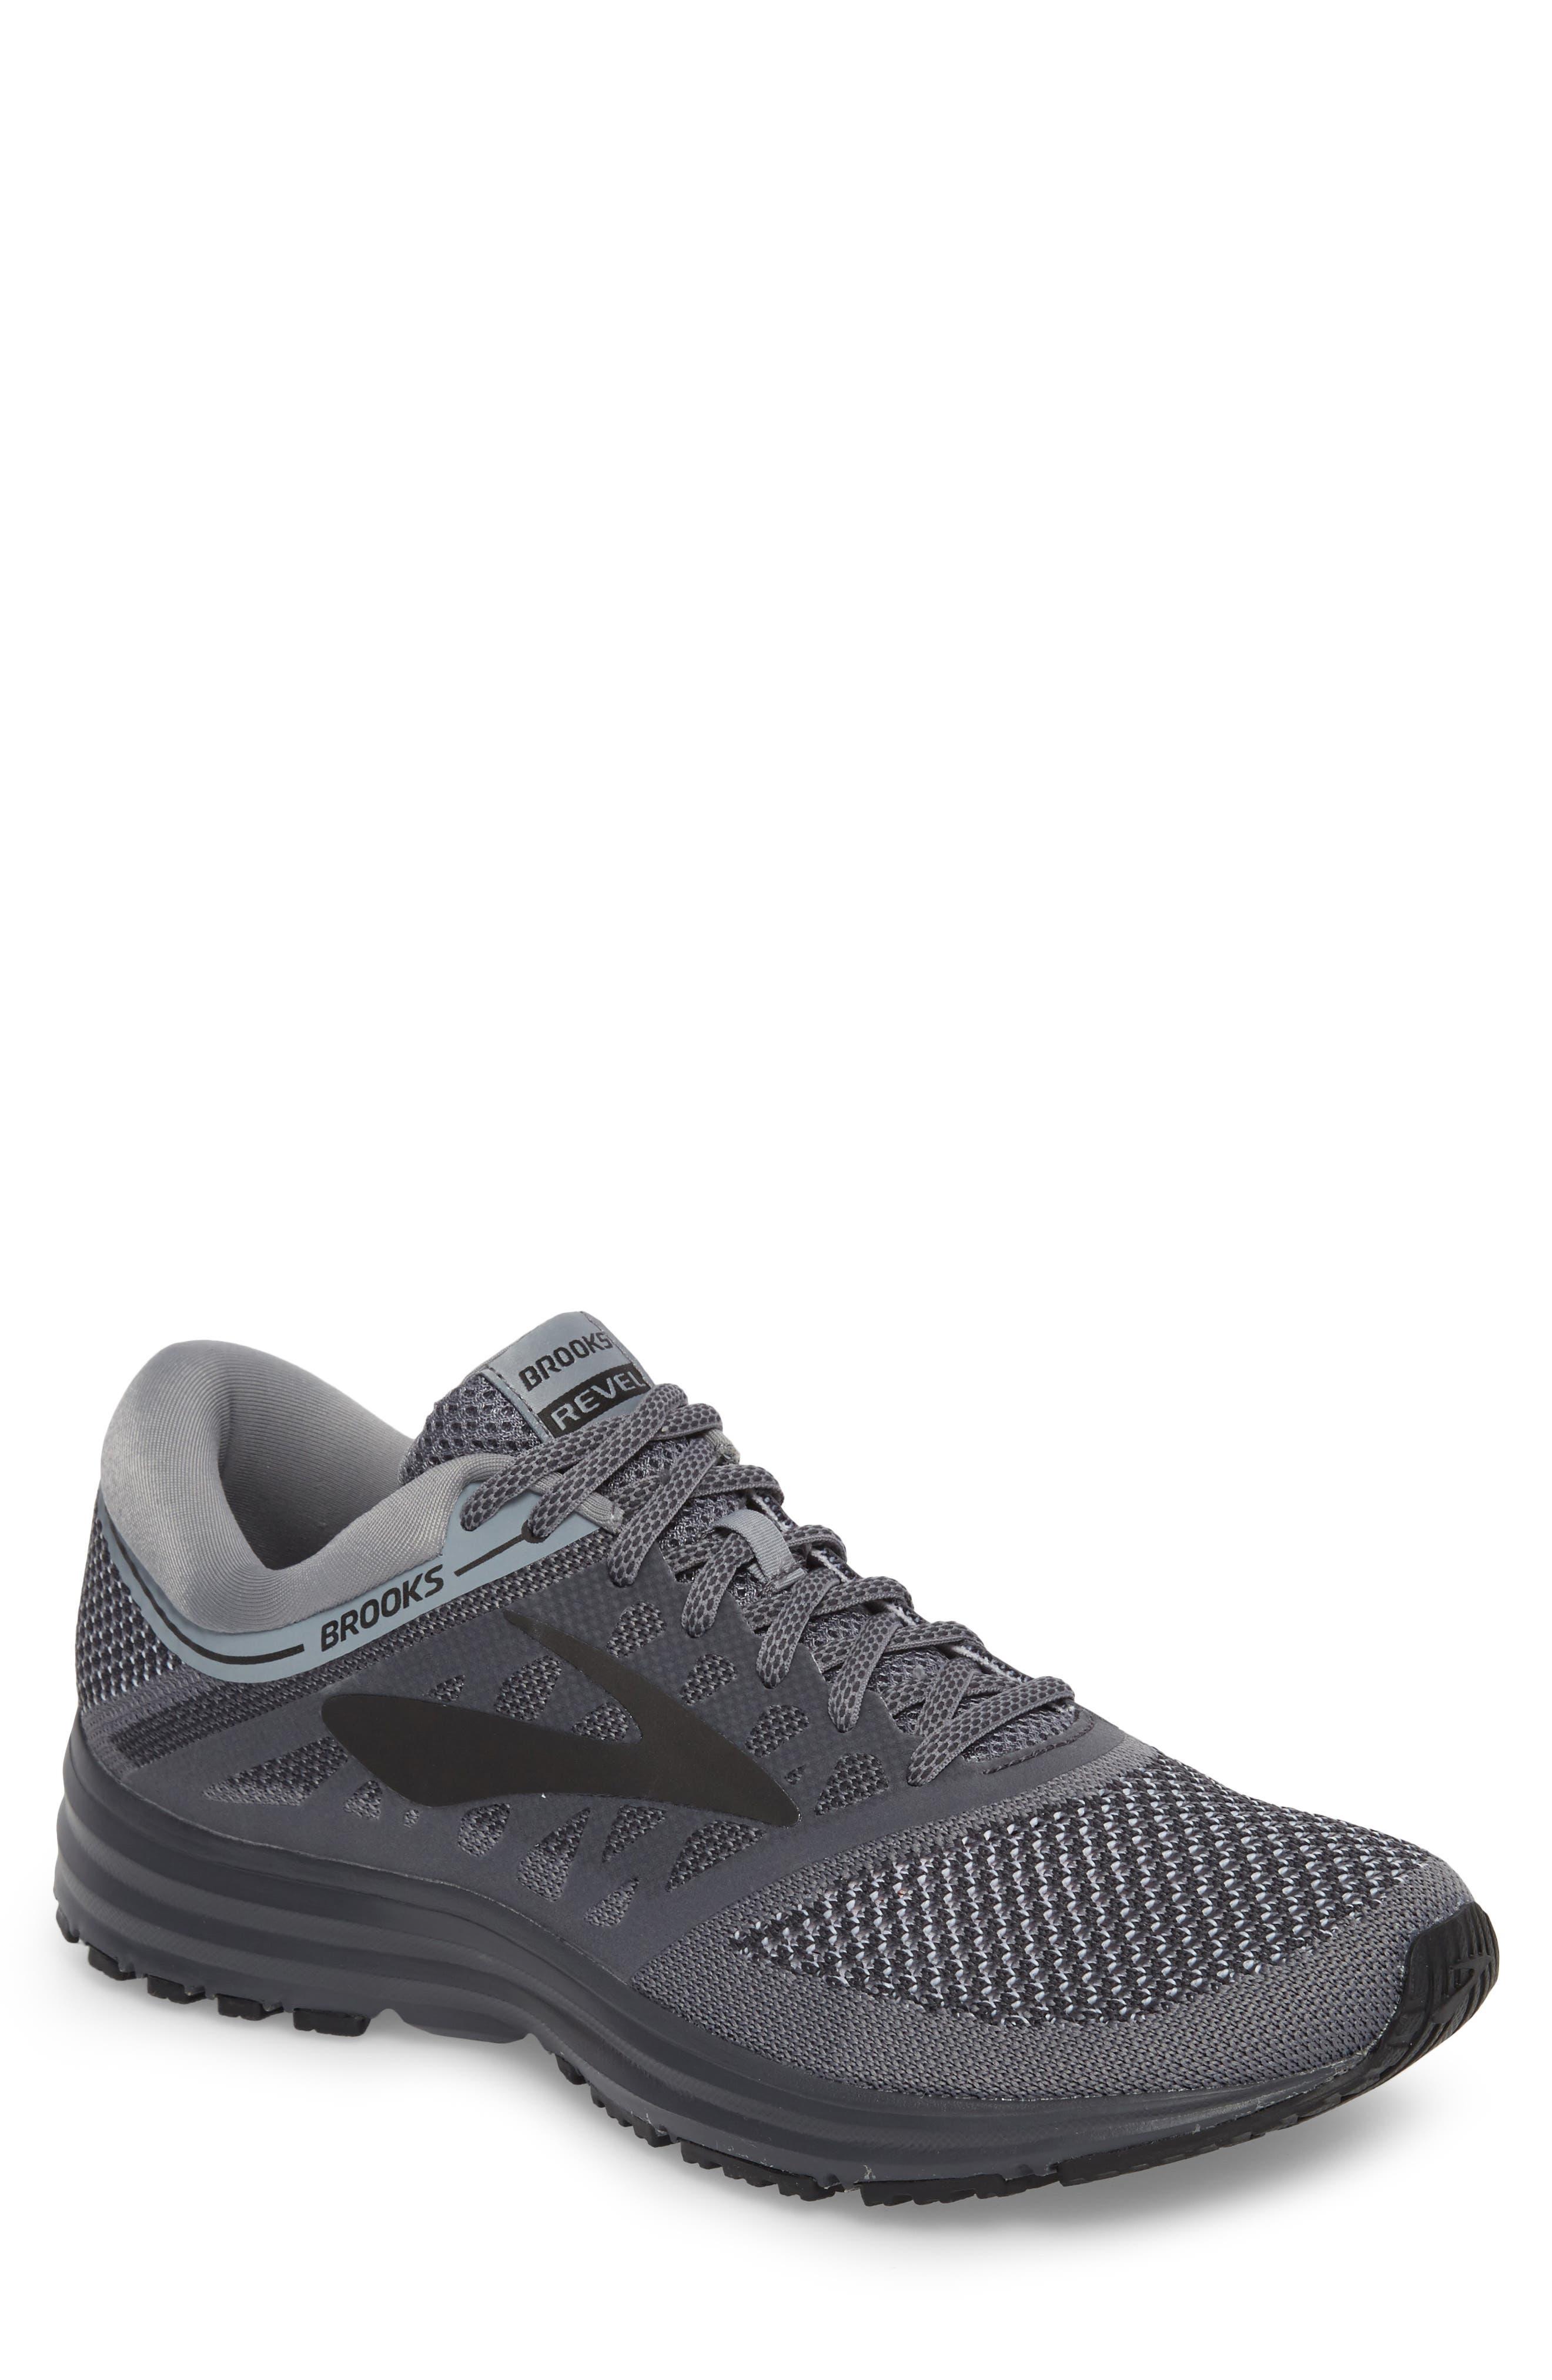 Revel Sneaker,                             Main thumbnail 1, color,                             089